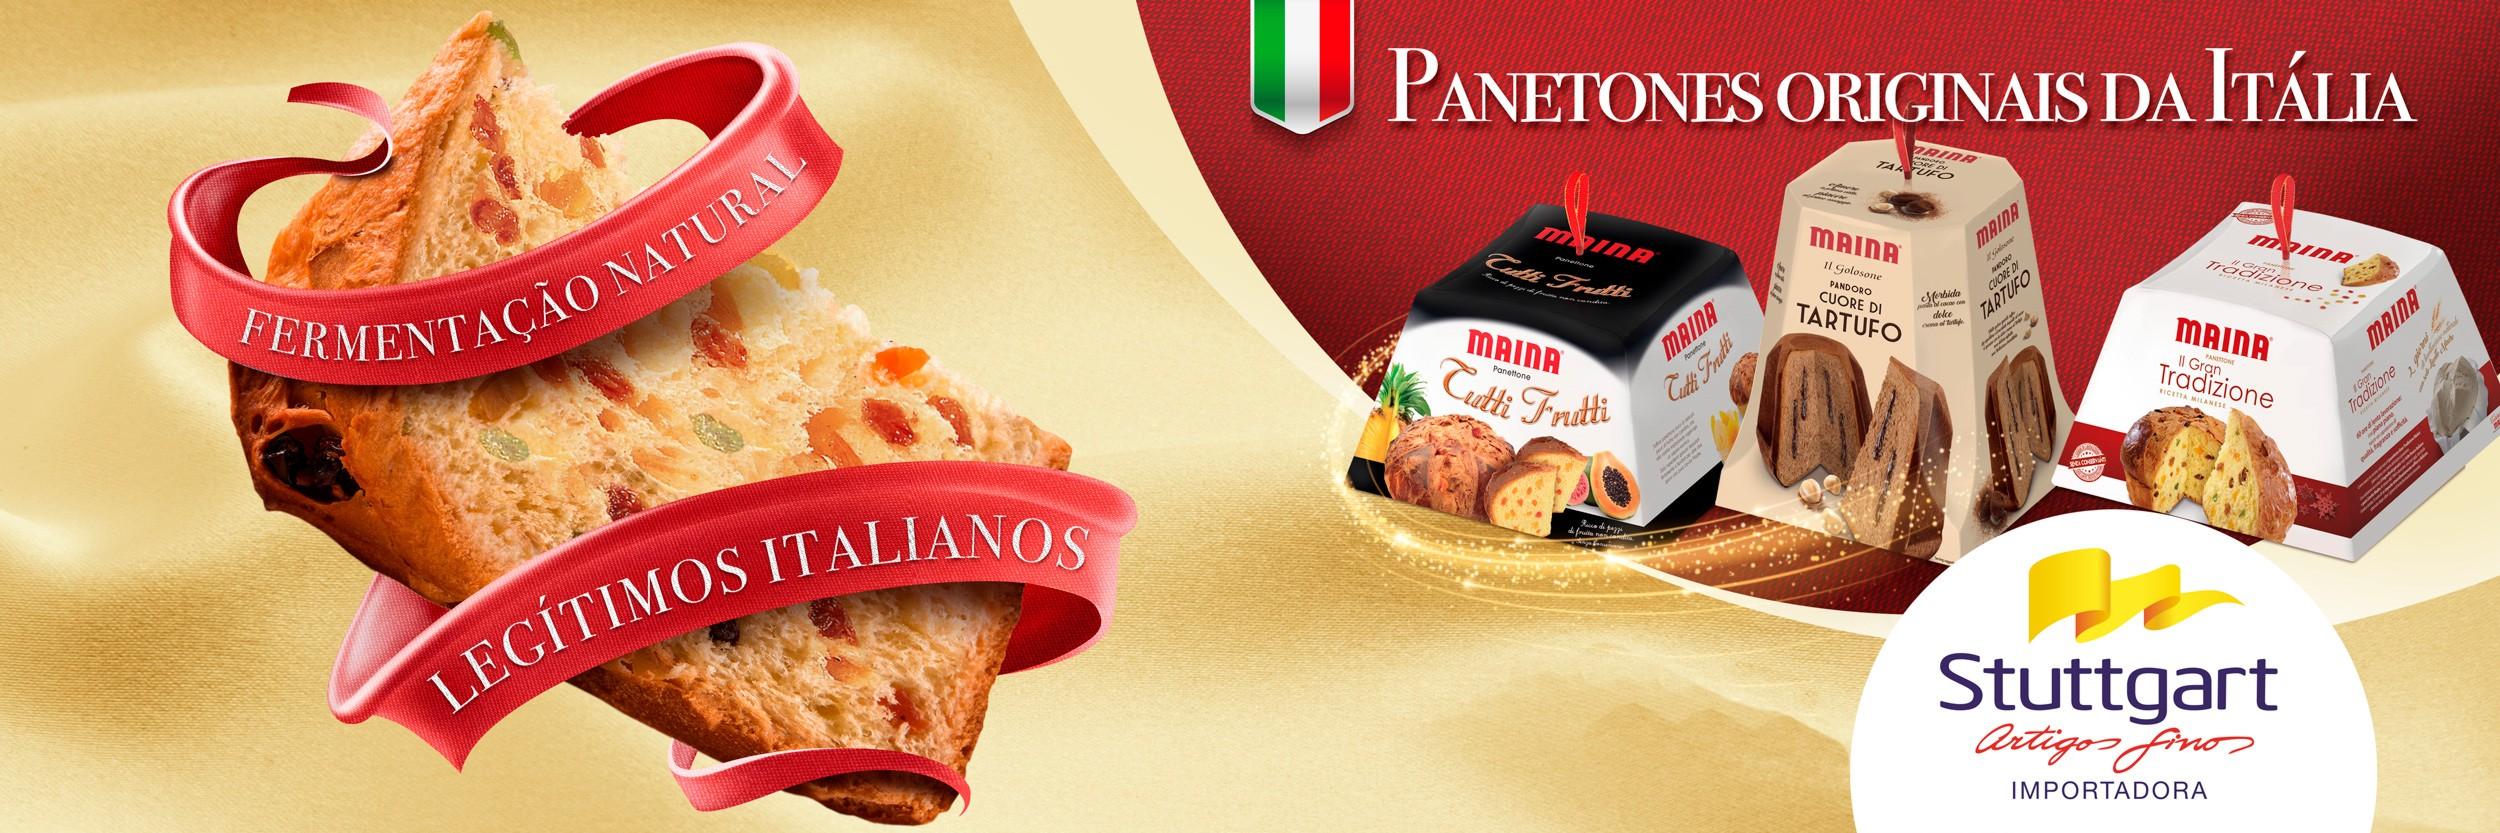 Panetones italianos